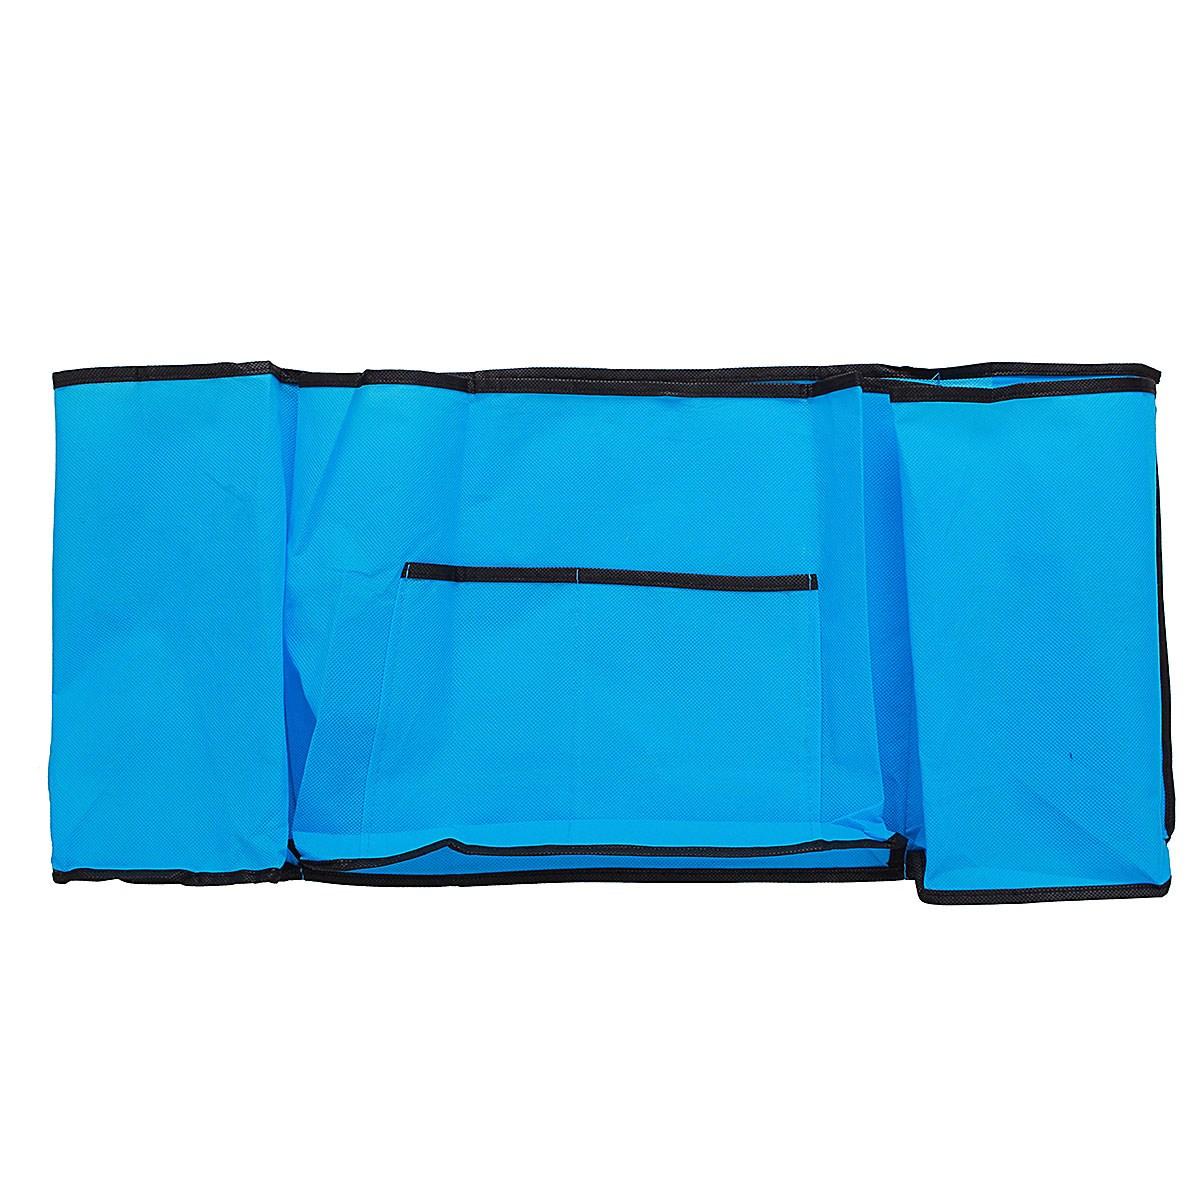 Sundries Magazines Remote control books Phone Tissue Holder Organizer Bed Sofa Hanging Bedside Storage Bag(China (Mainland))